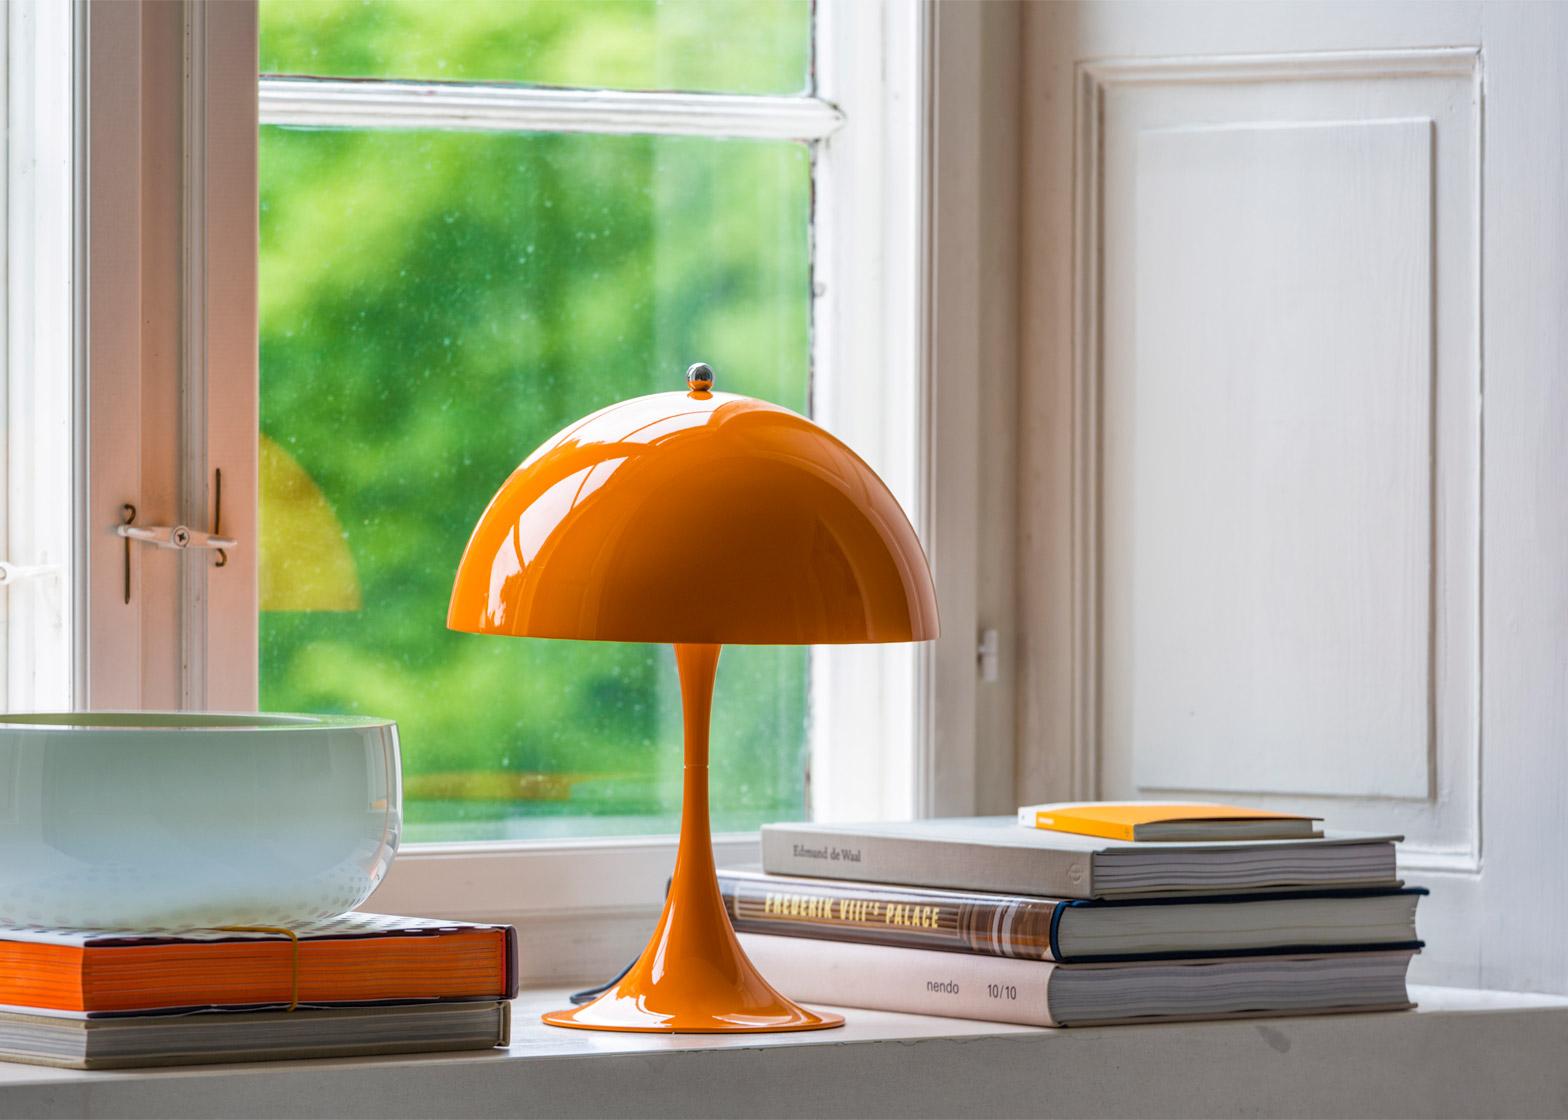 inredningshj lpen panthella mini louis poulsen. Black Bedroom Furniture Sets. Home Design Ideas